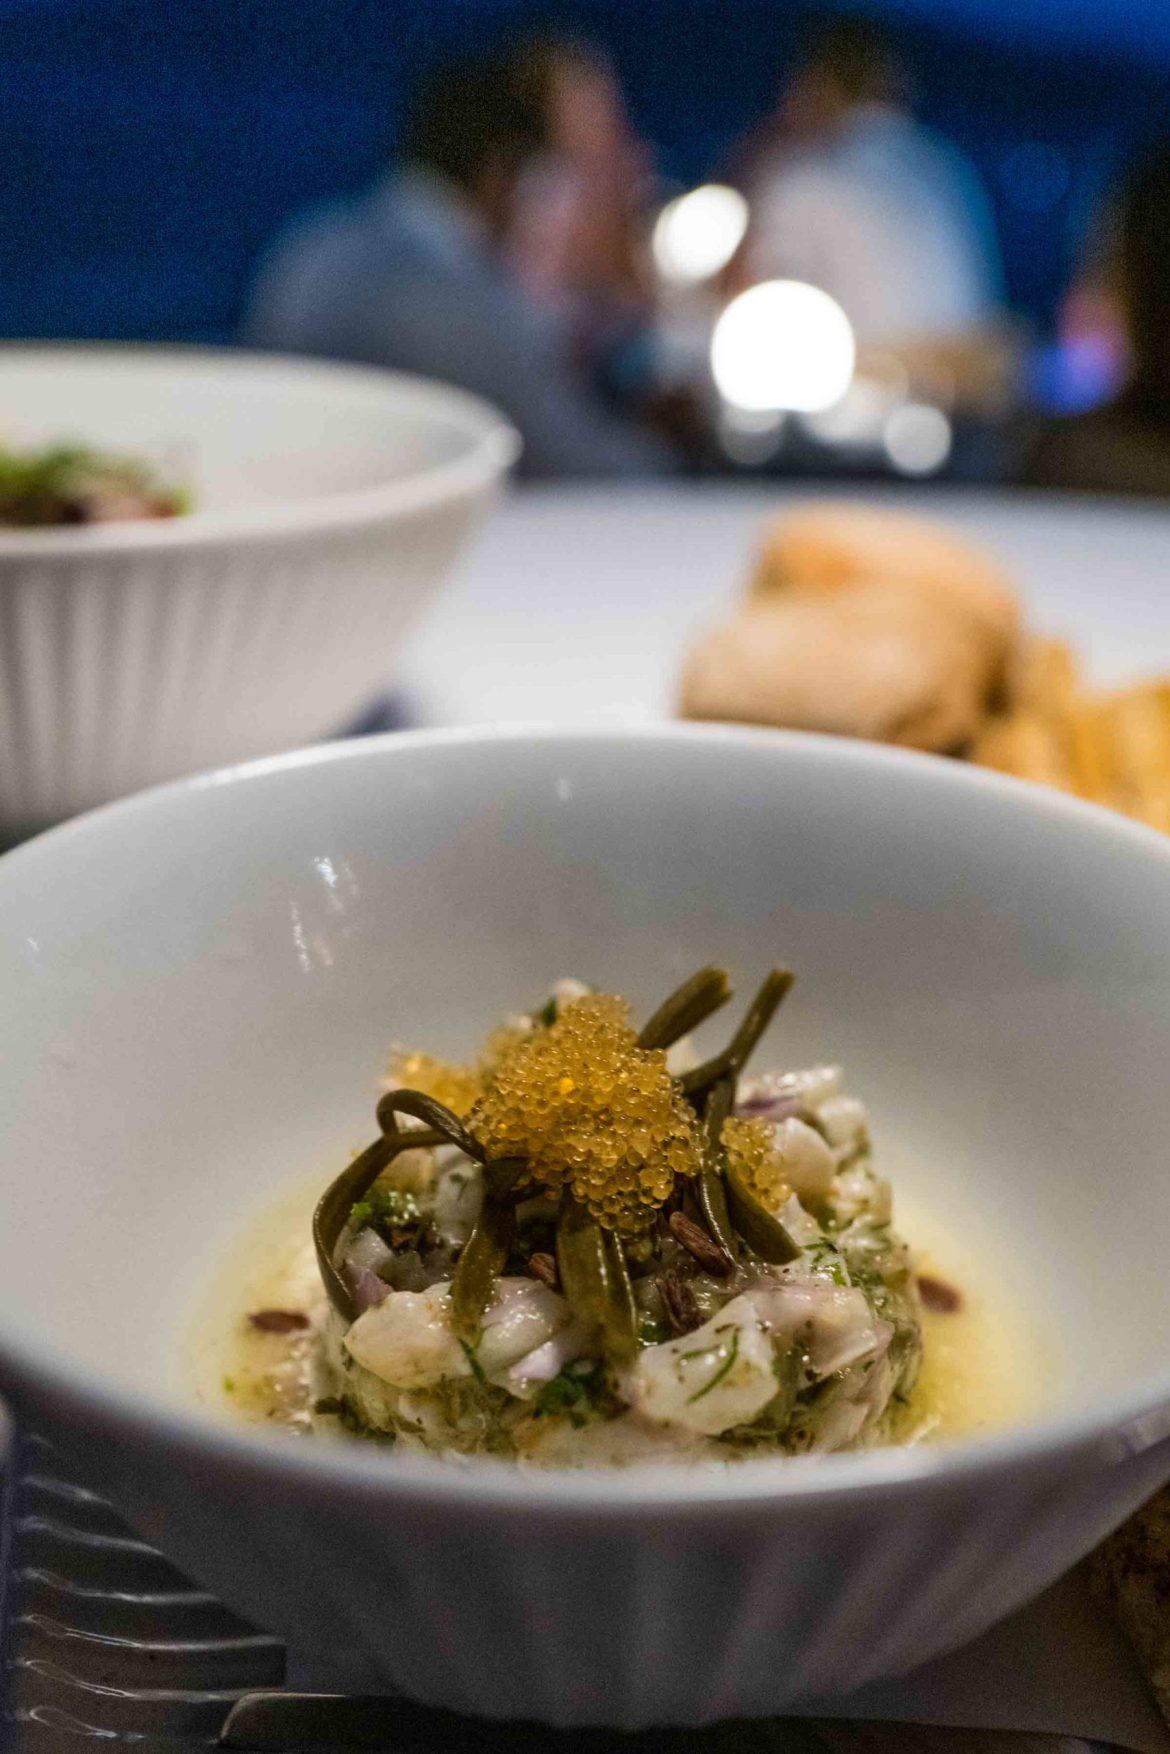 Chef Polychronis Damalas at Saint Suites Hotel Santorini Greece